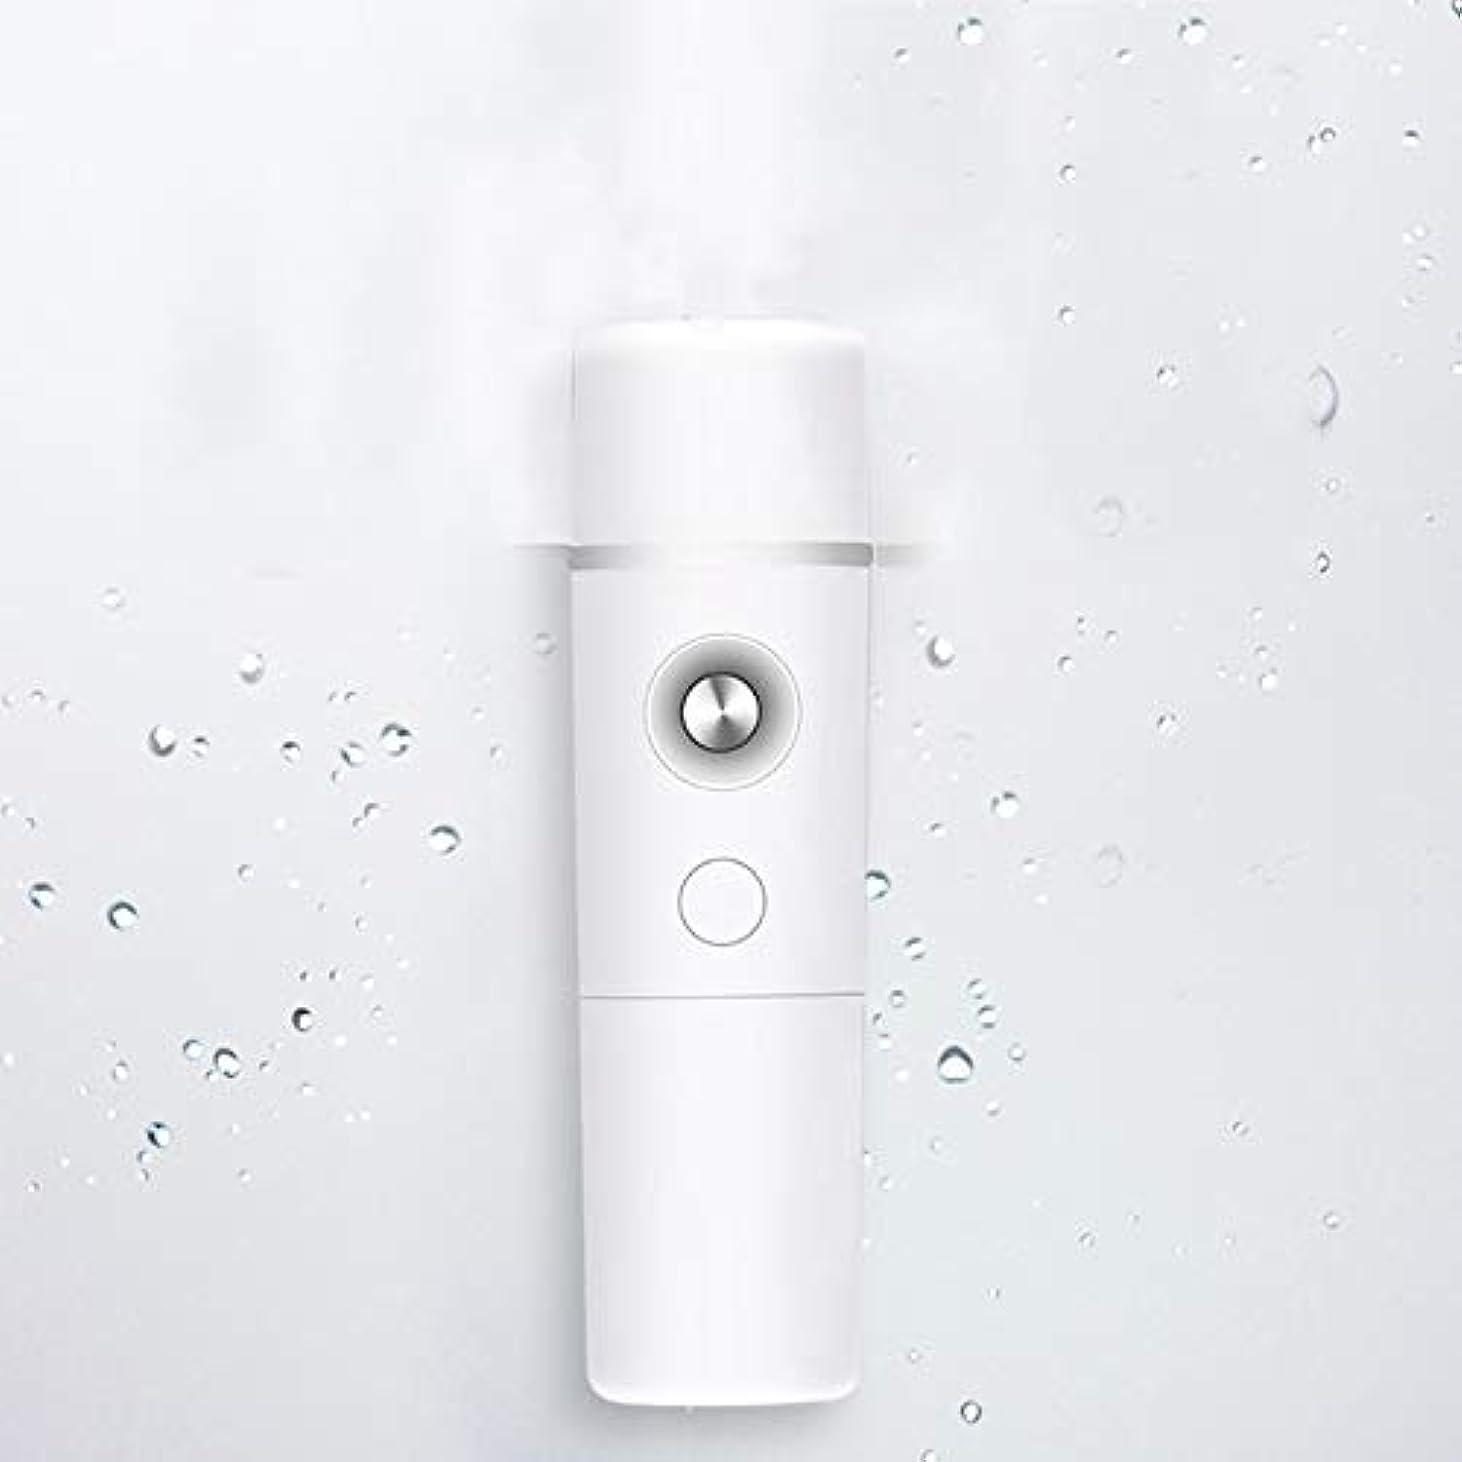 ZXF ナノスプレー水和機器スチームフェイスコールドスプレー美容機器ポータブル保湿フェイシャルフェイシャル加湿機器バッテリーホワイト 滑らかである